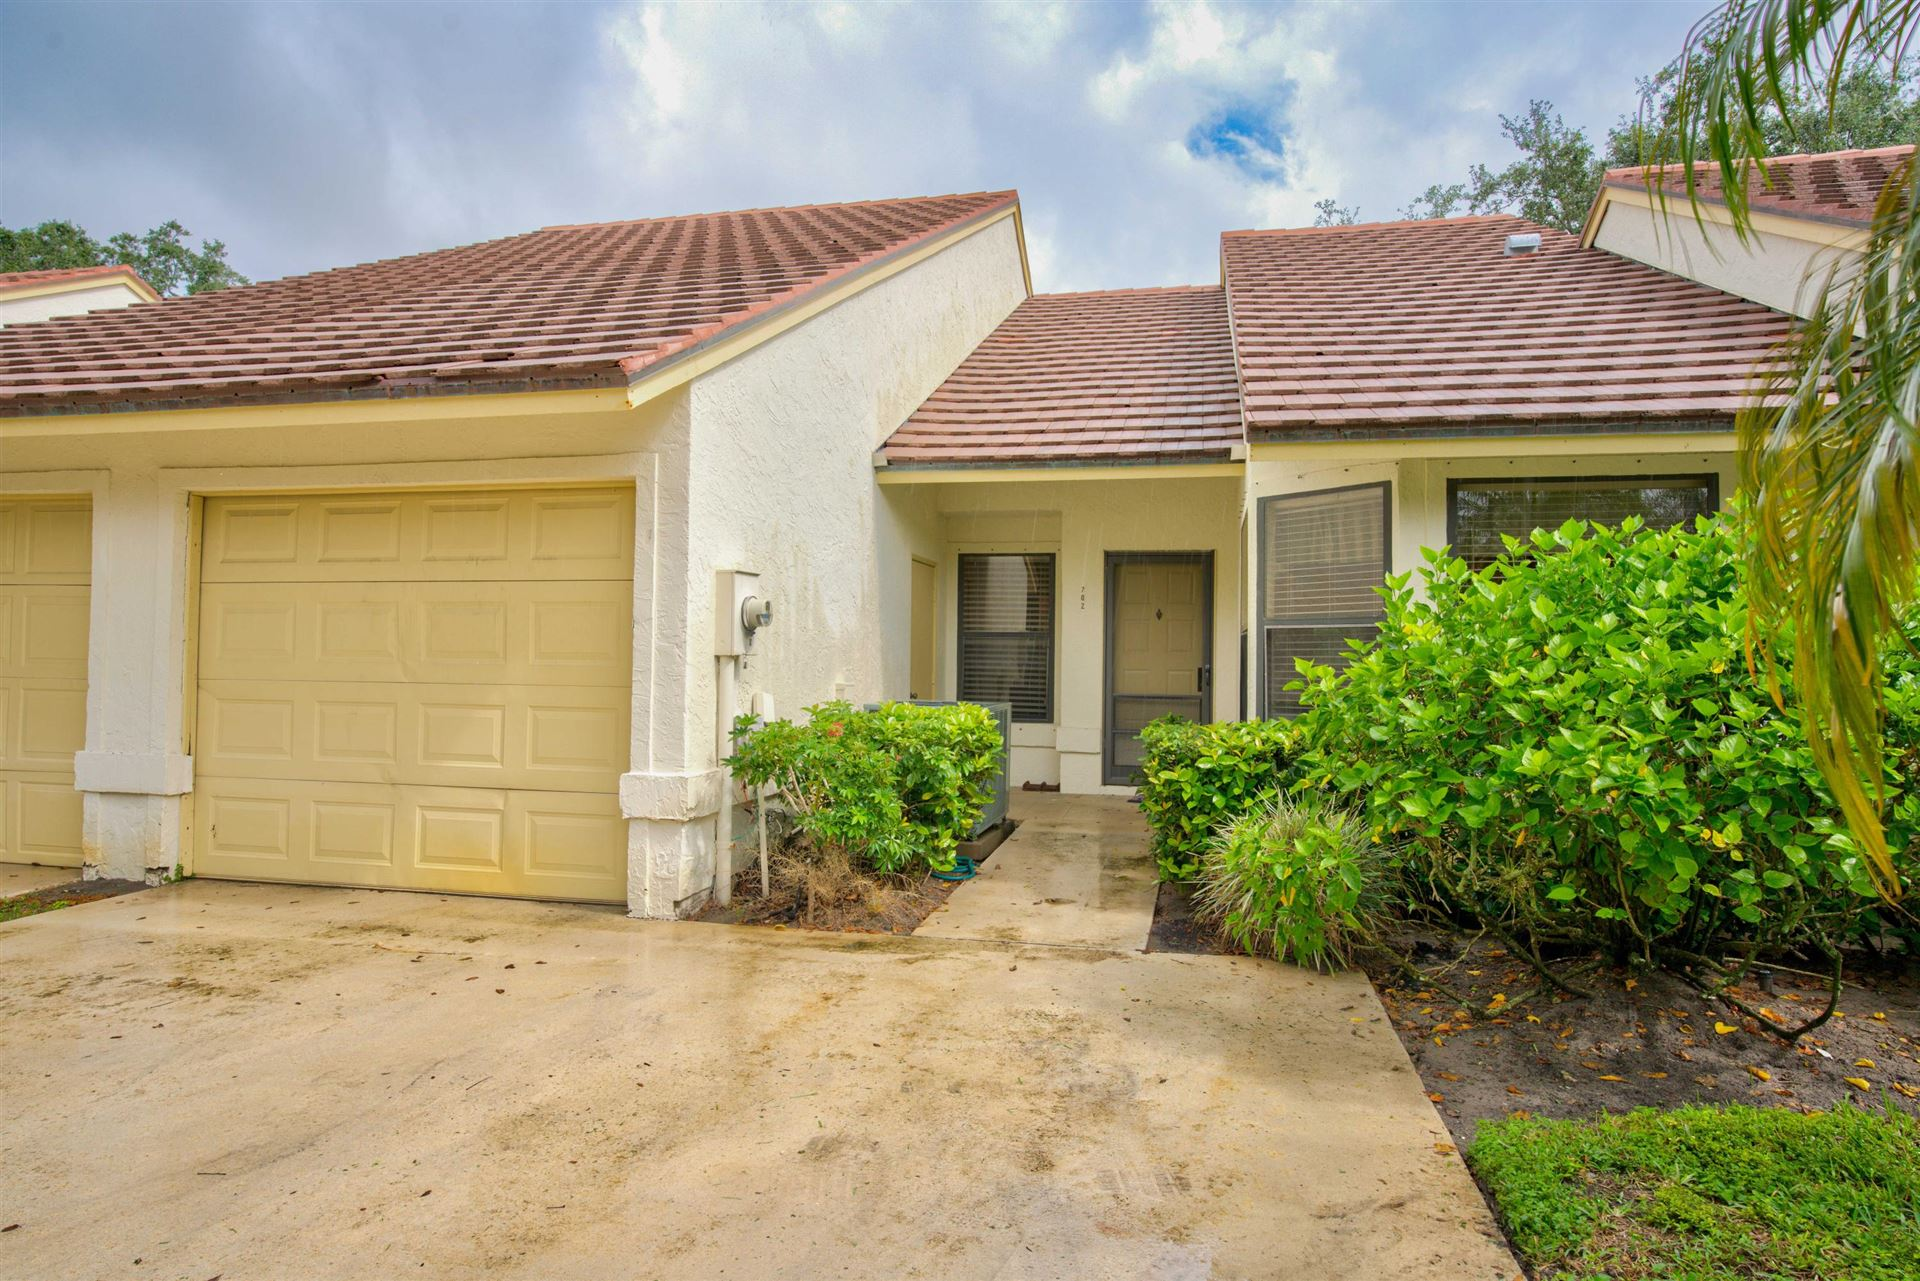 Photo of 702 Saint Giles Court, Palm Beach Gardens, FL 33418 (MLS # RX-10662487)